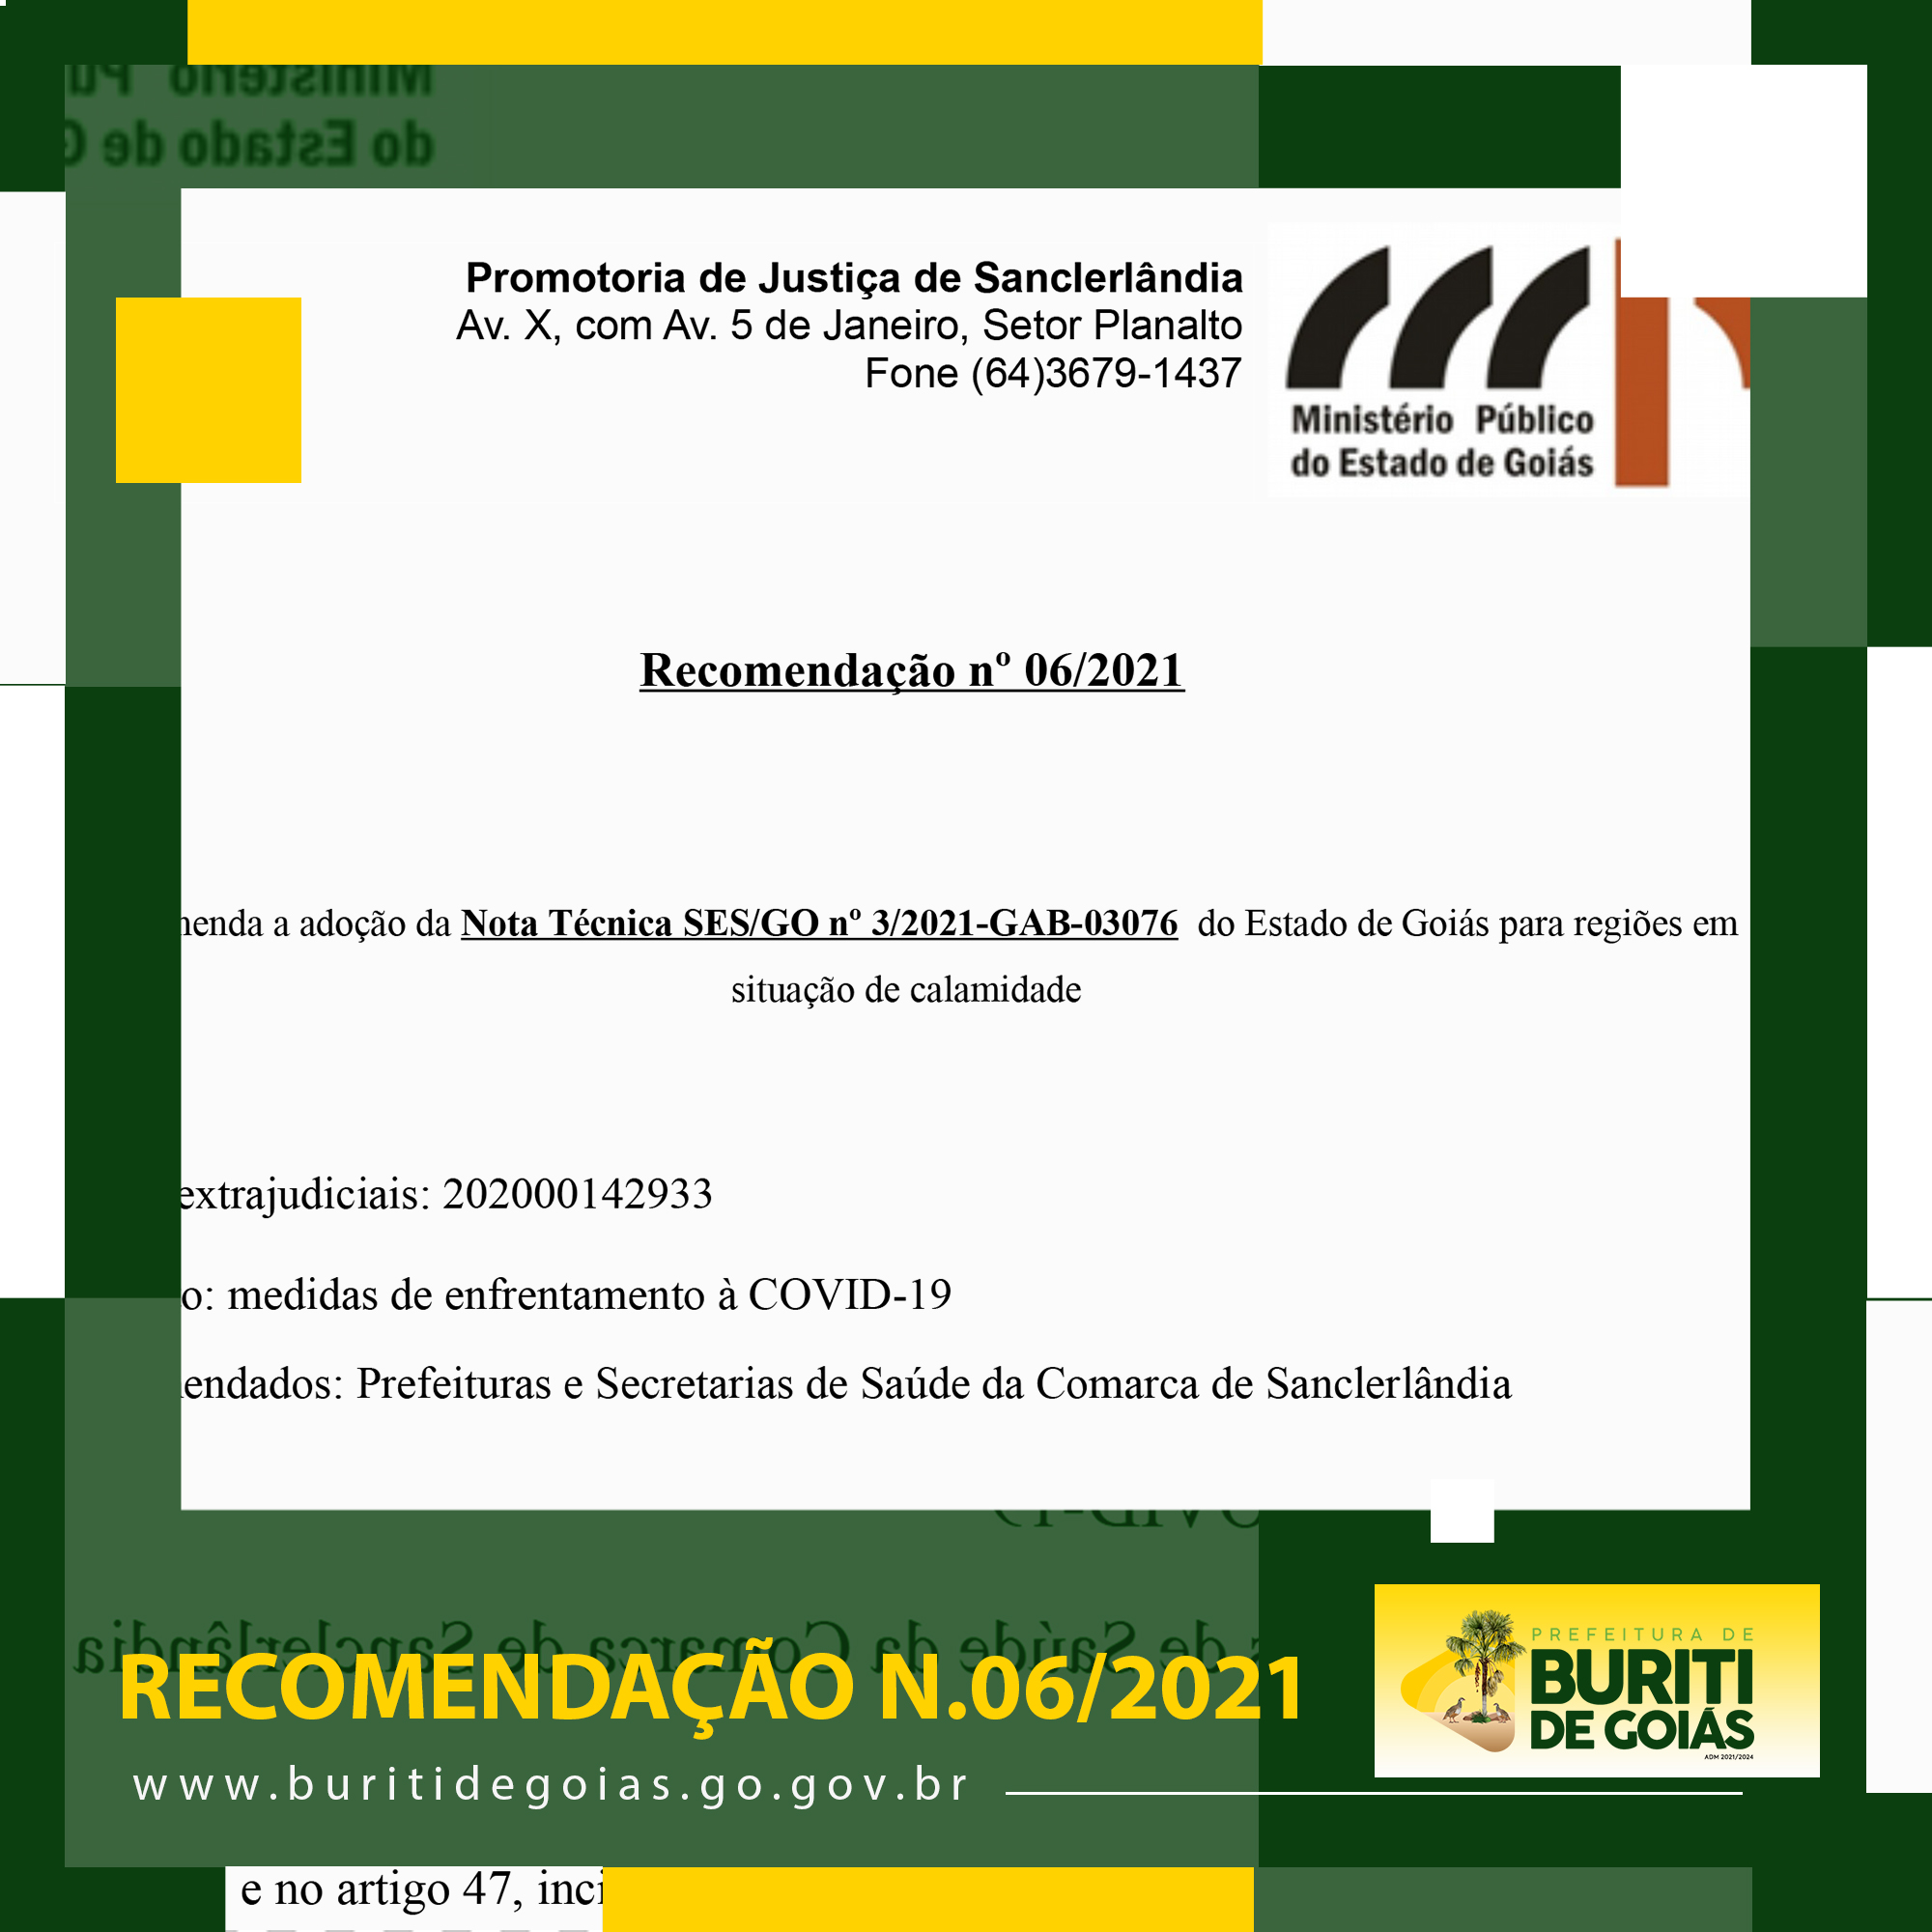 RECOMENDAÇÃO 06/2021 – PROMOTORIA DE JUSTIÇA DE SANCLERLÂNDIA